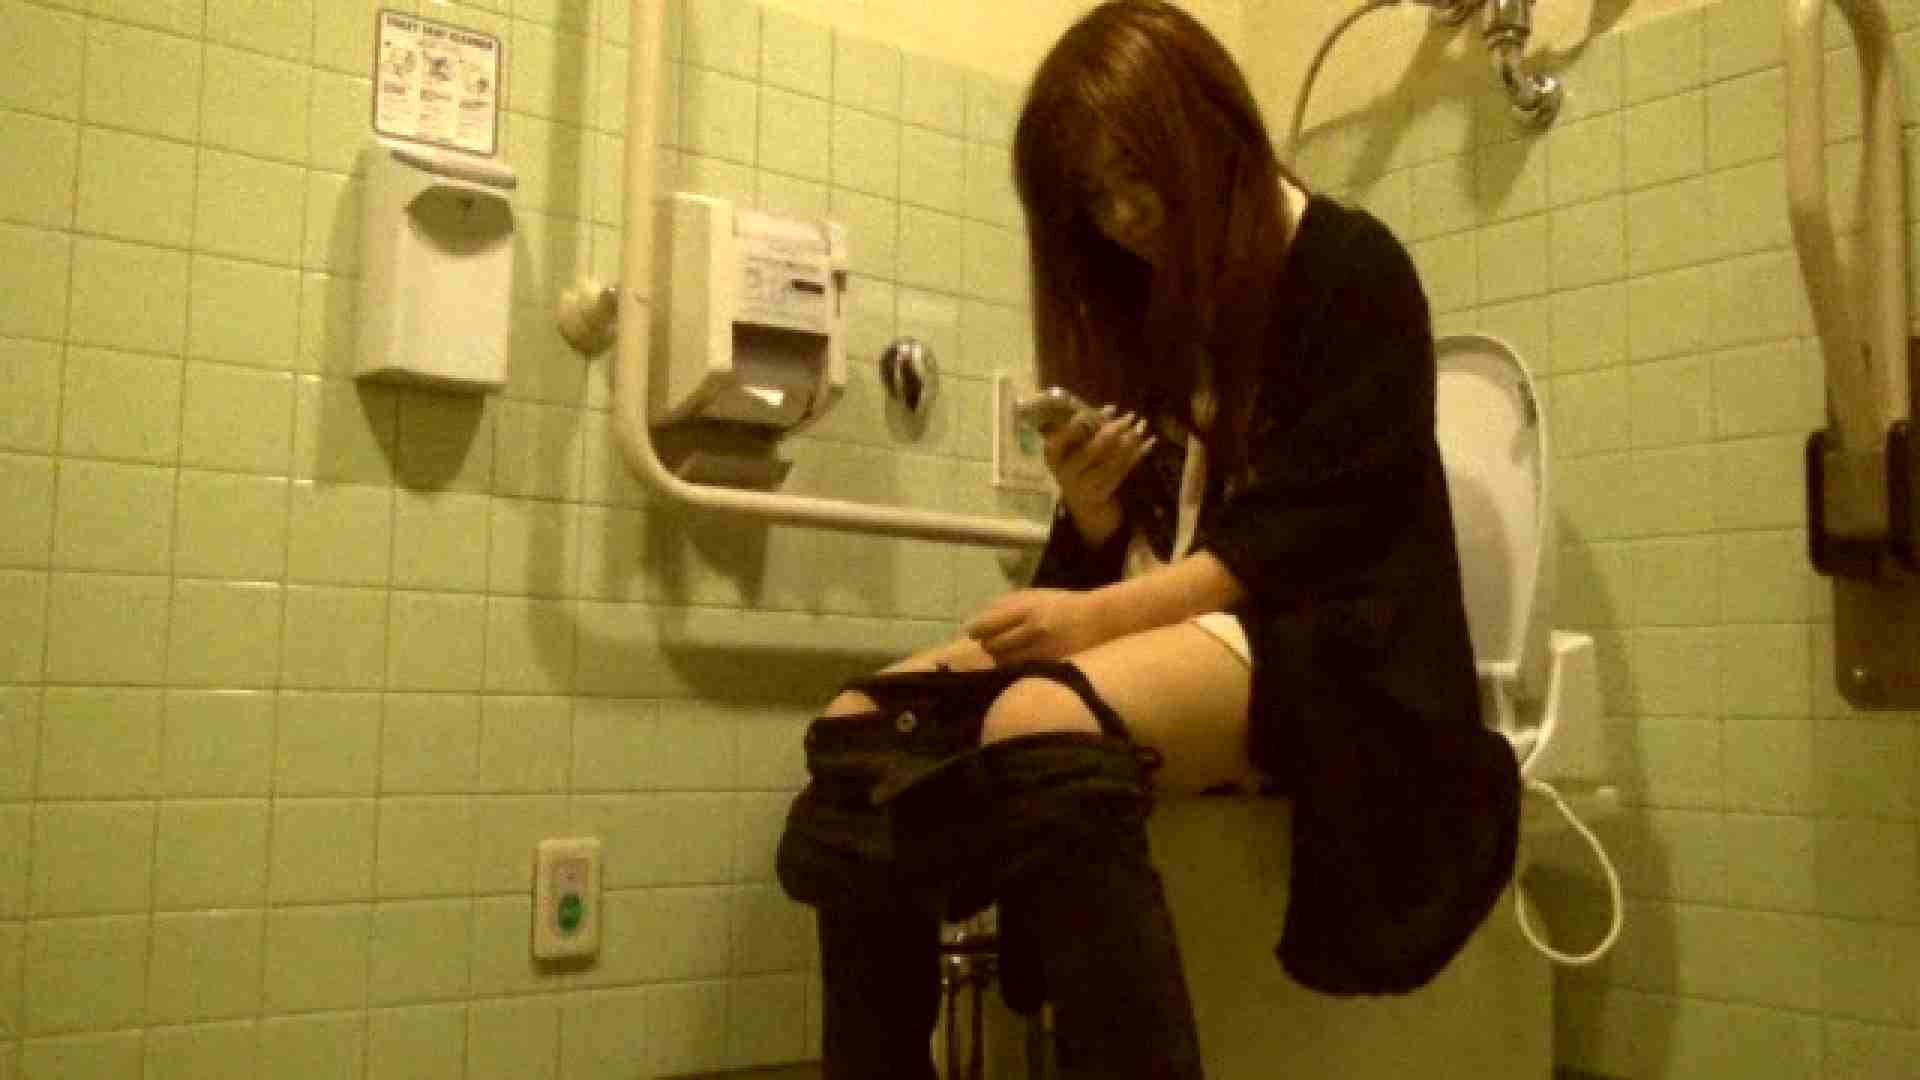 vol.26 【SKちゃん(洗面所)】ガールズバー店員 19歳 洗面所   キャバ嬢  56画像 43